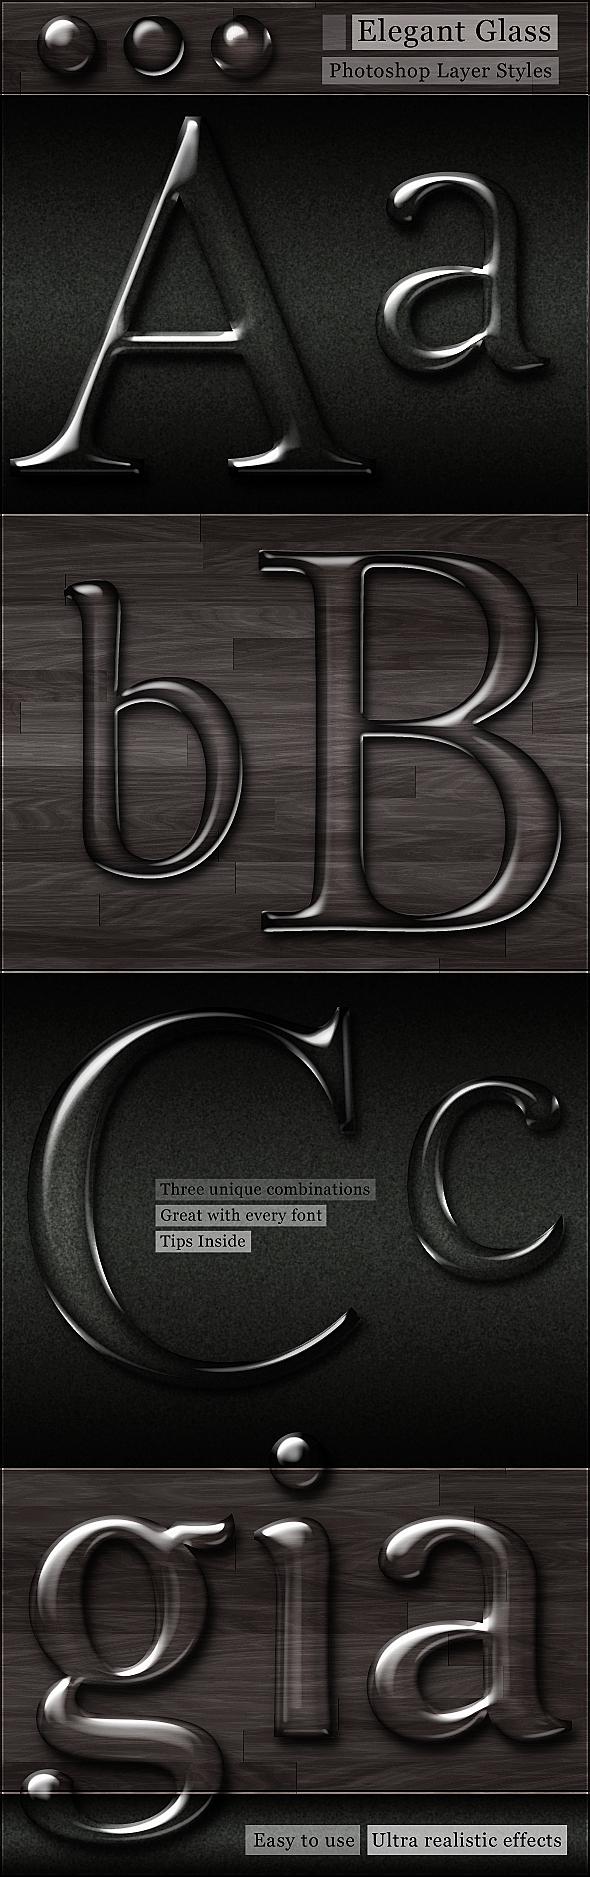 Free Glass Photoshop Styles by Giallo86 on DeviantArt